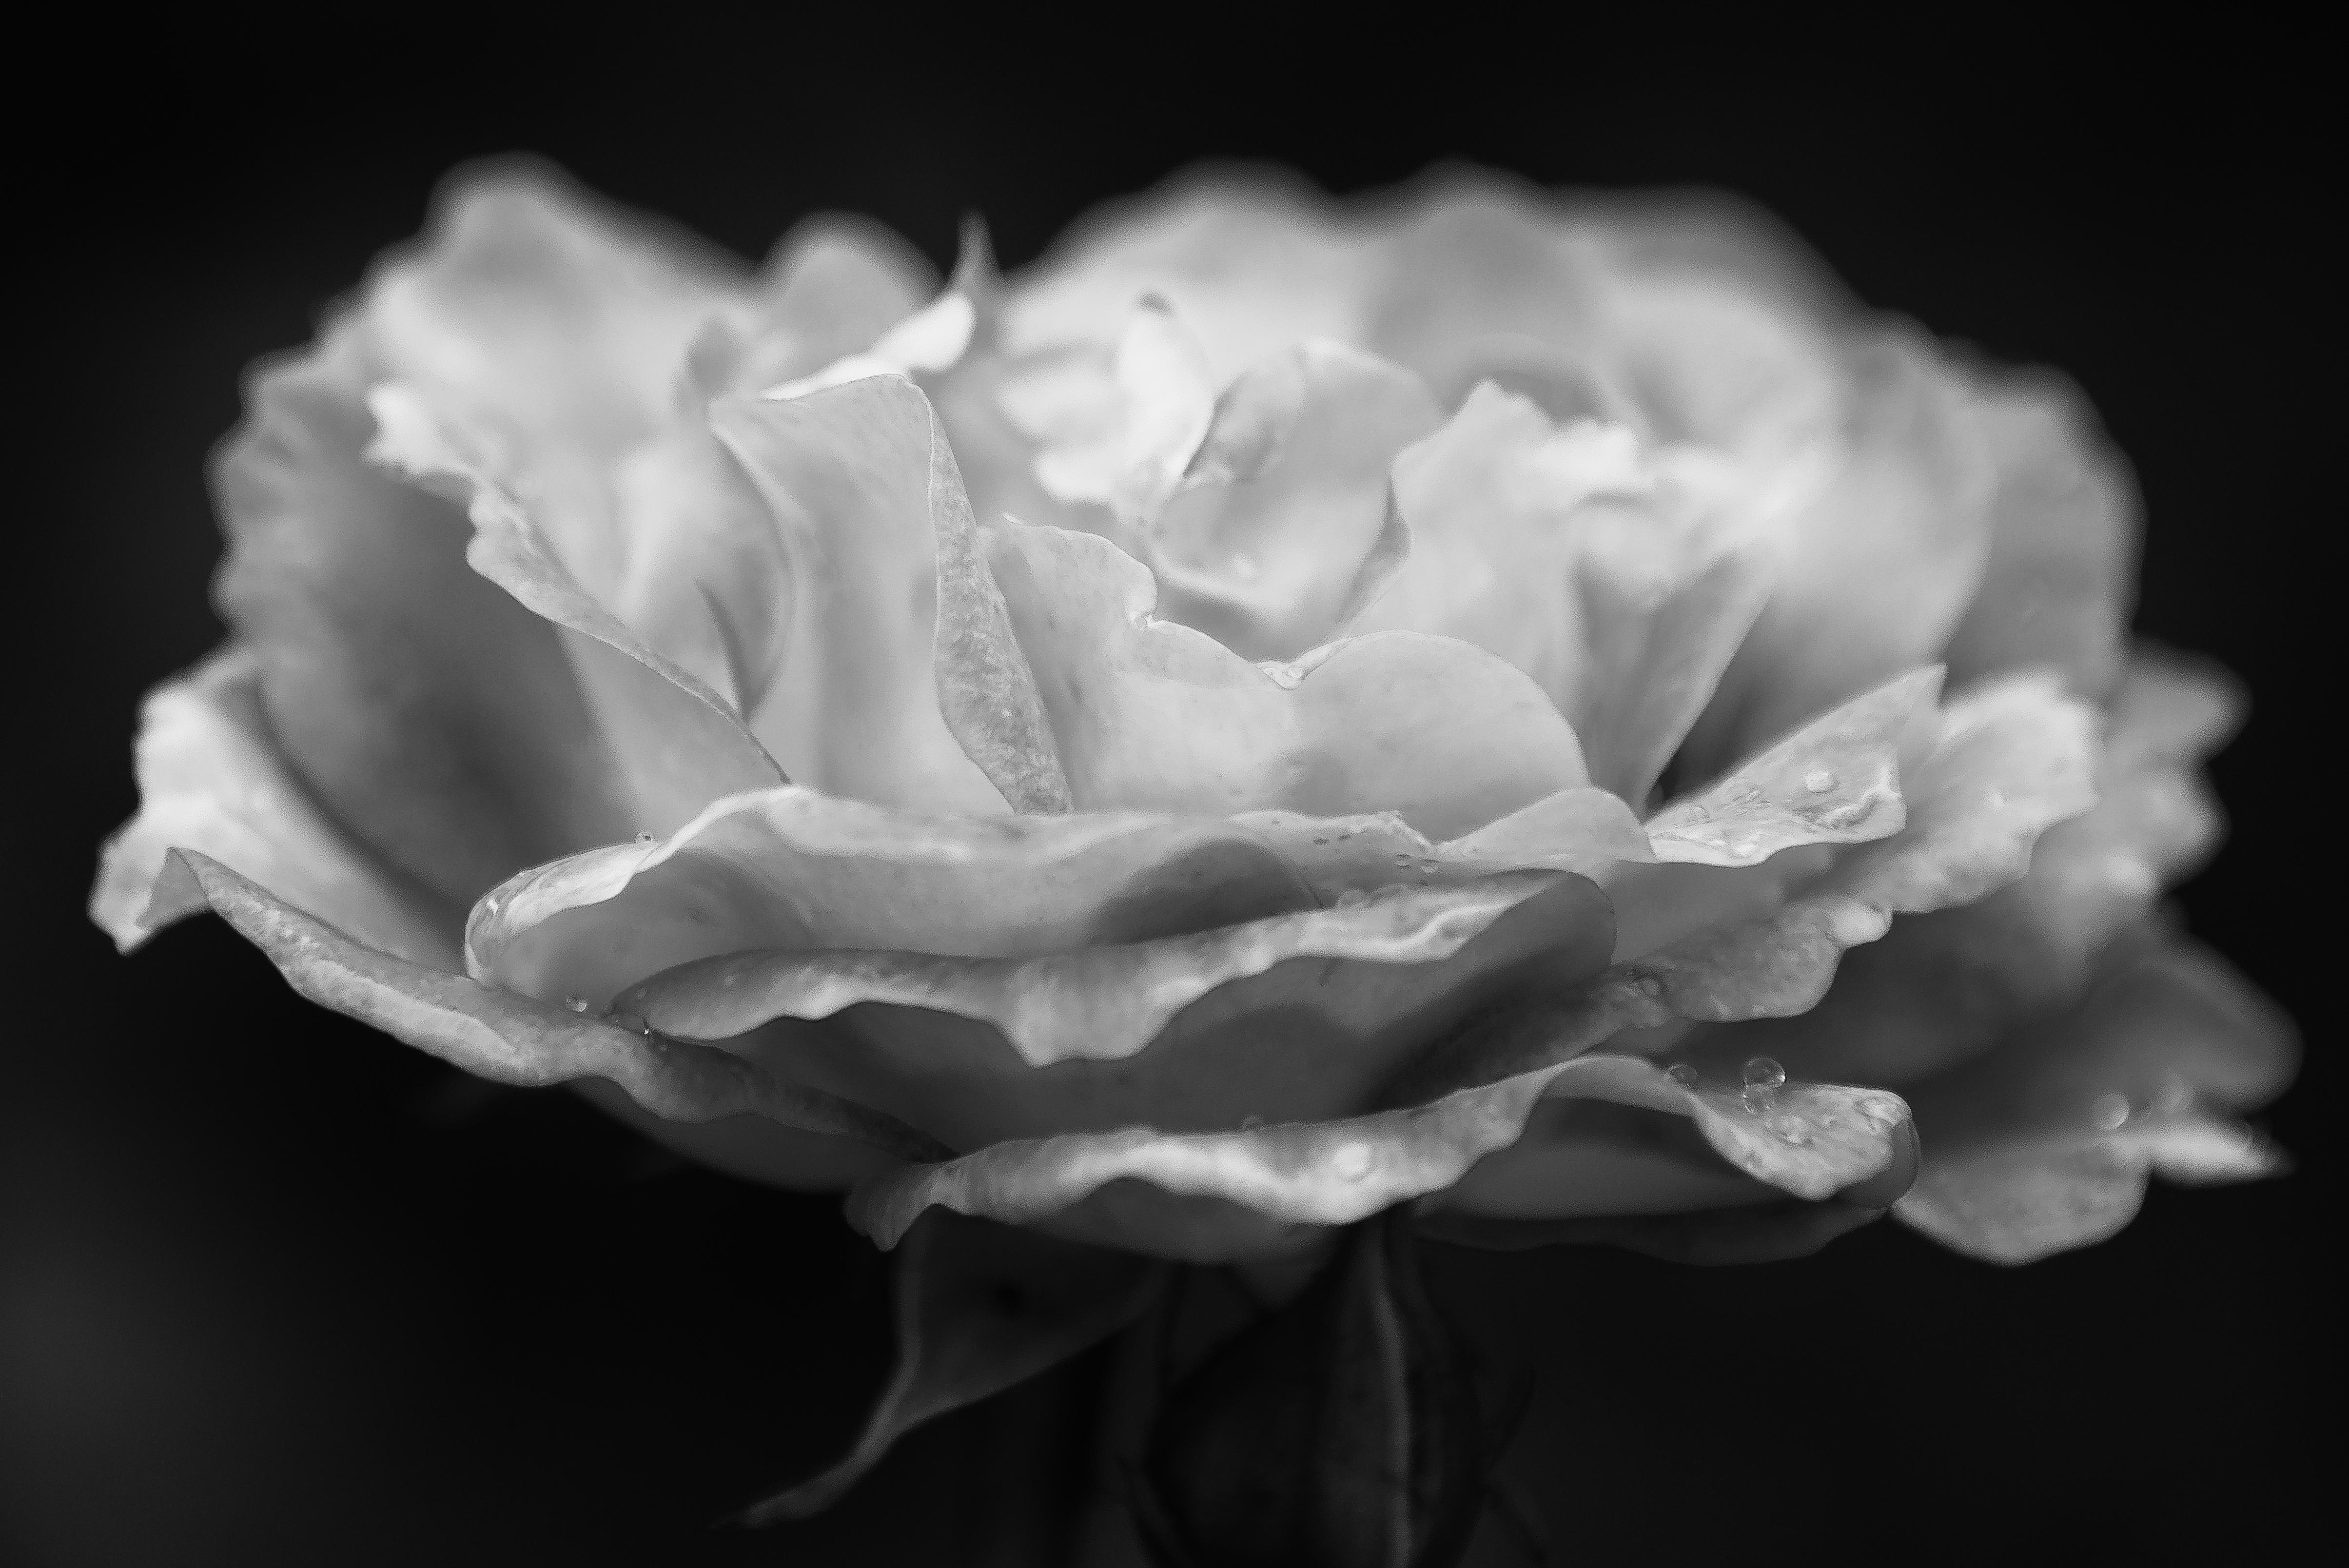 Free Images Blossom Black And White Flower Petal Flora Close